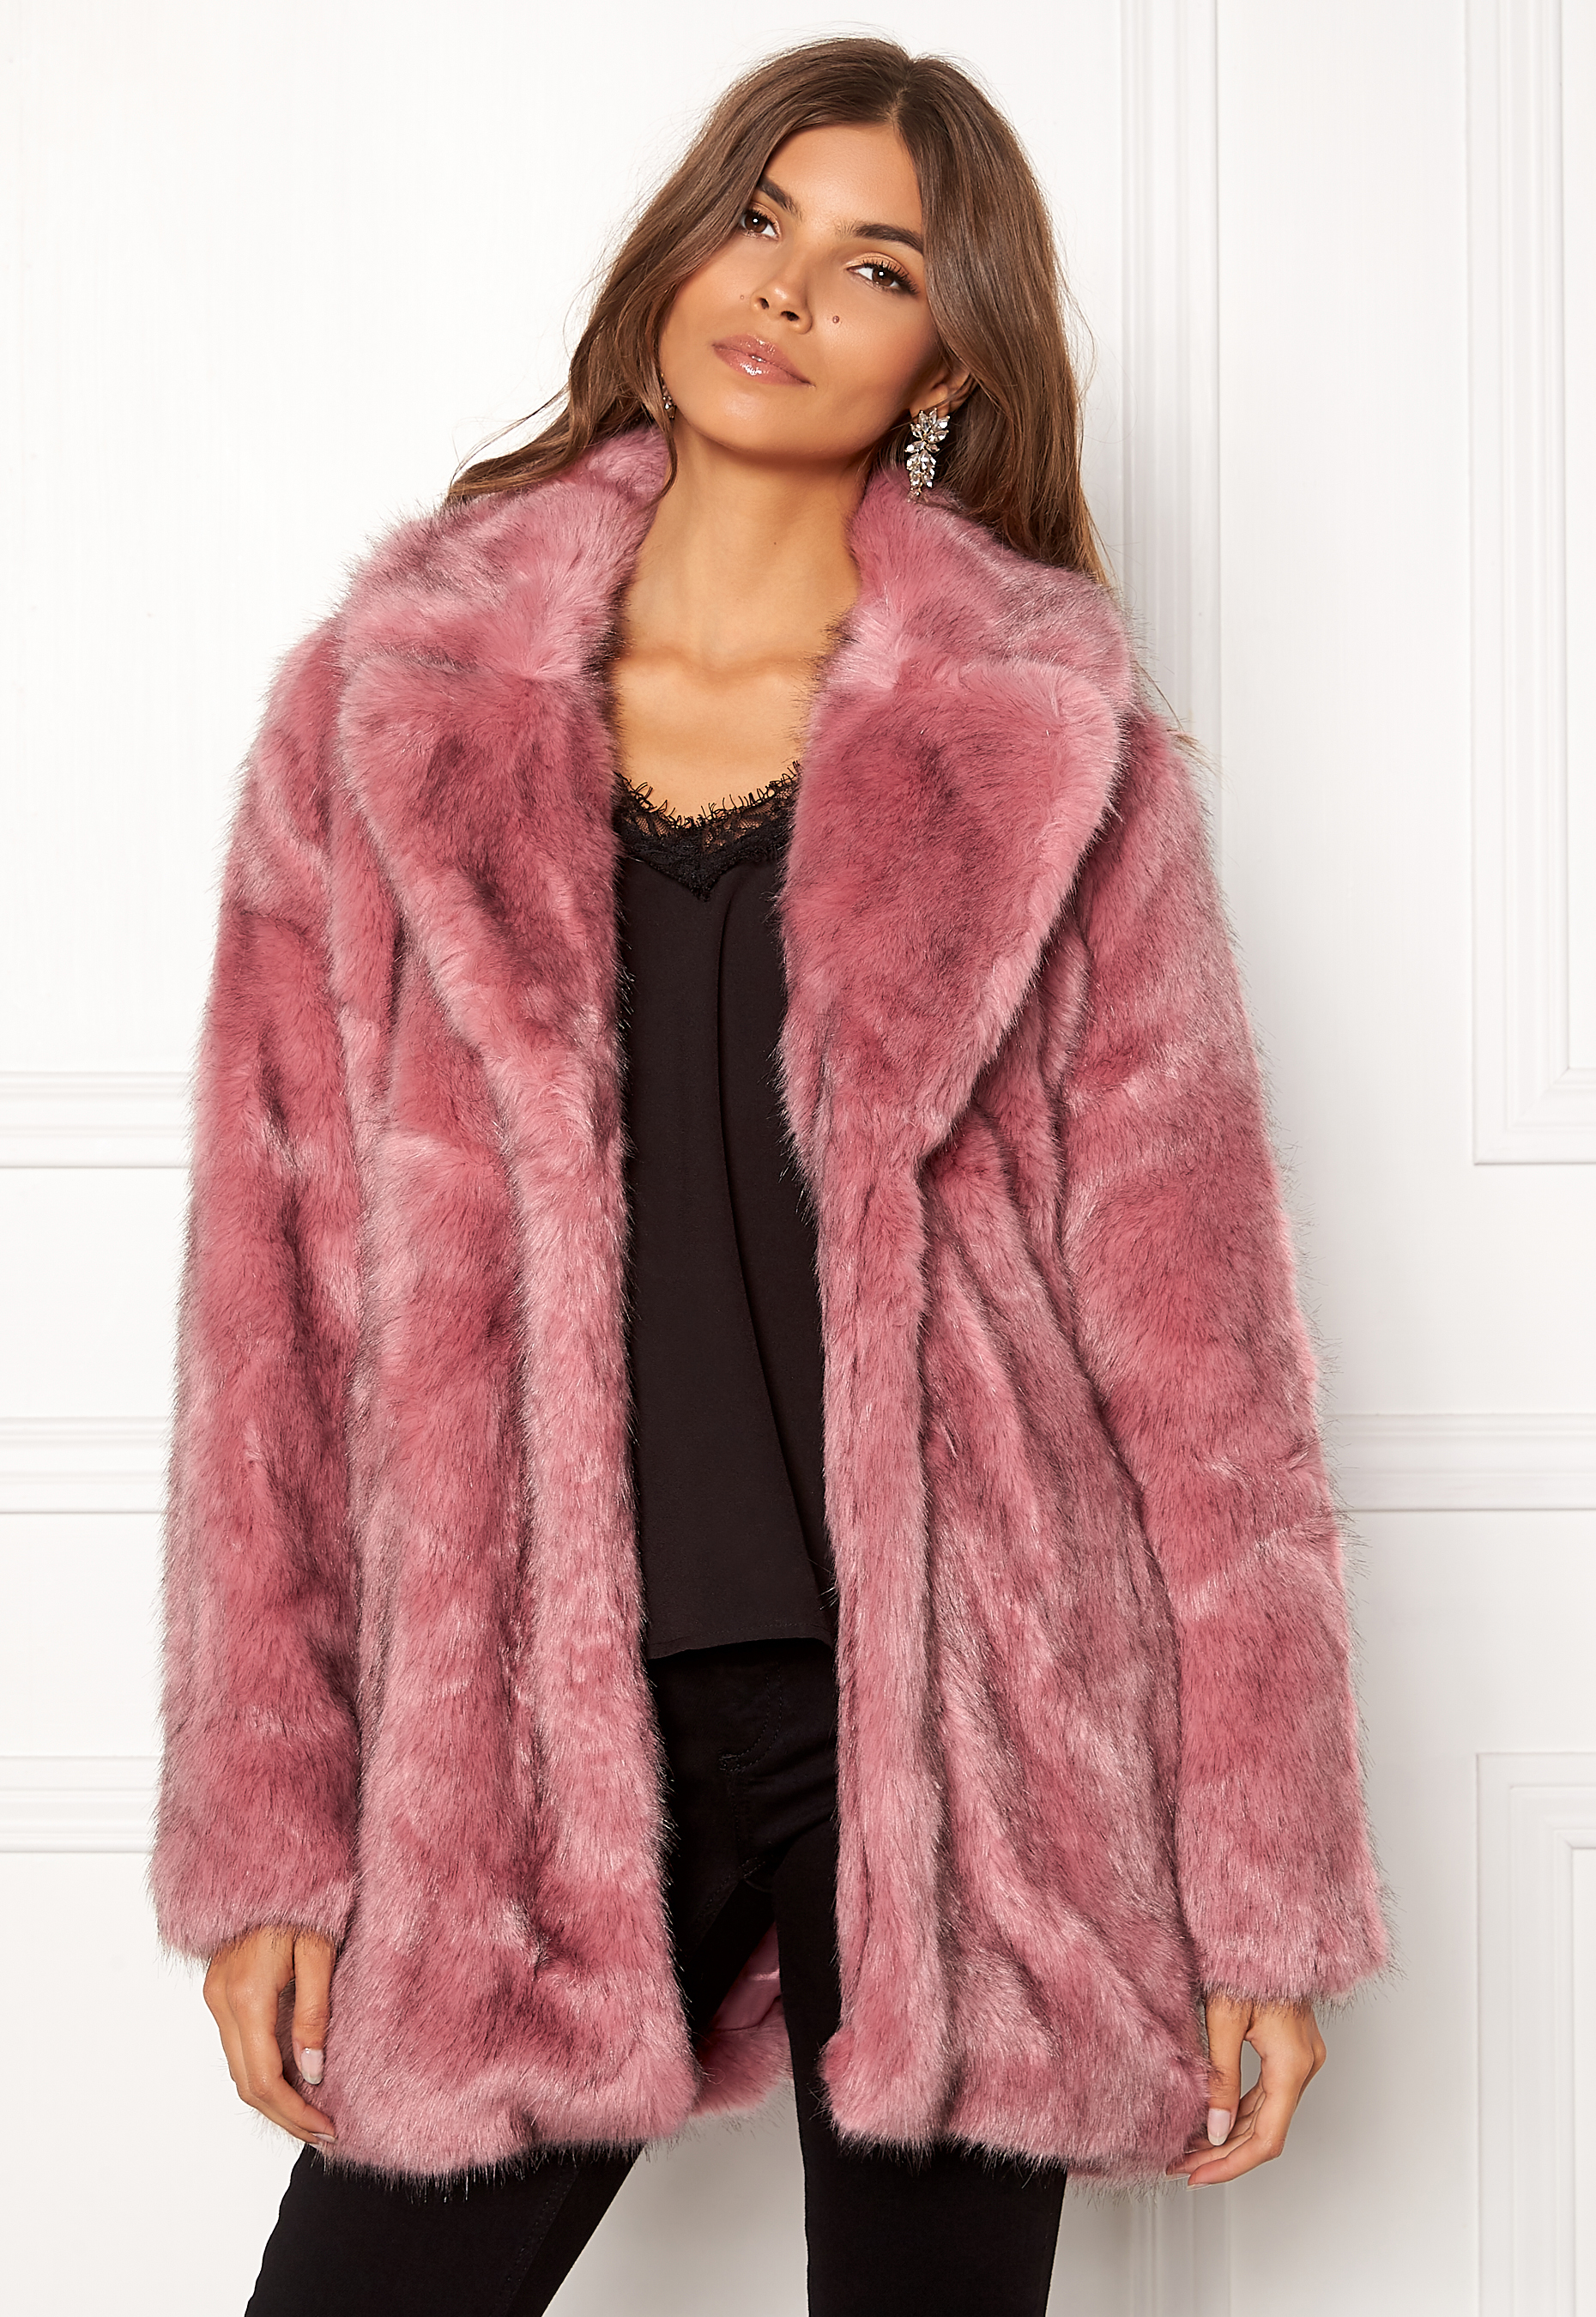 bc3a0deb63 Selected femme fury faux fur earth red bubbleroom fake fur bra jpg  1860x2700 Fake fur bra